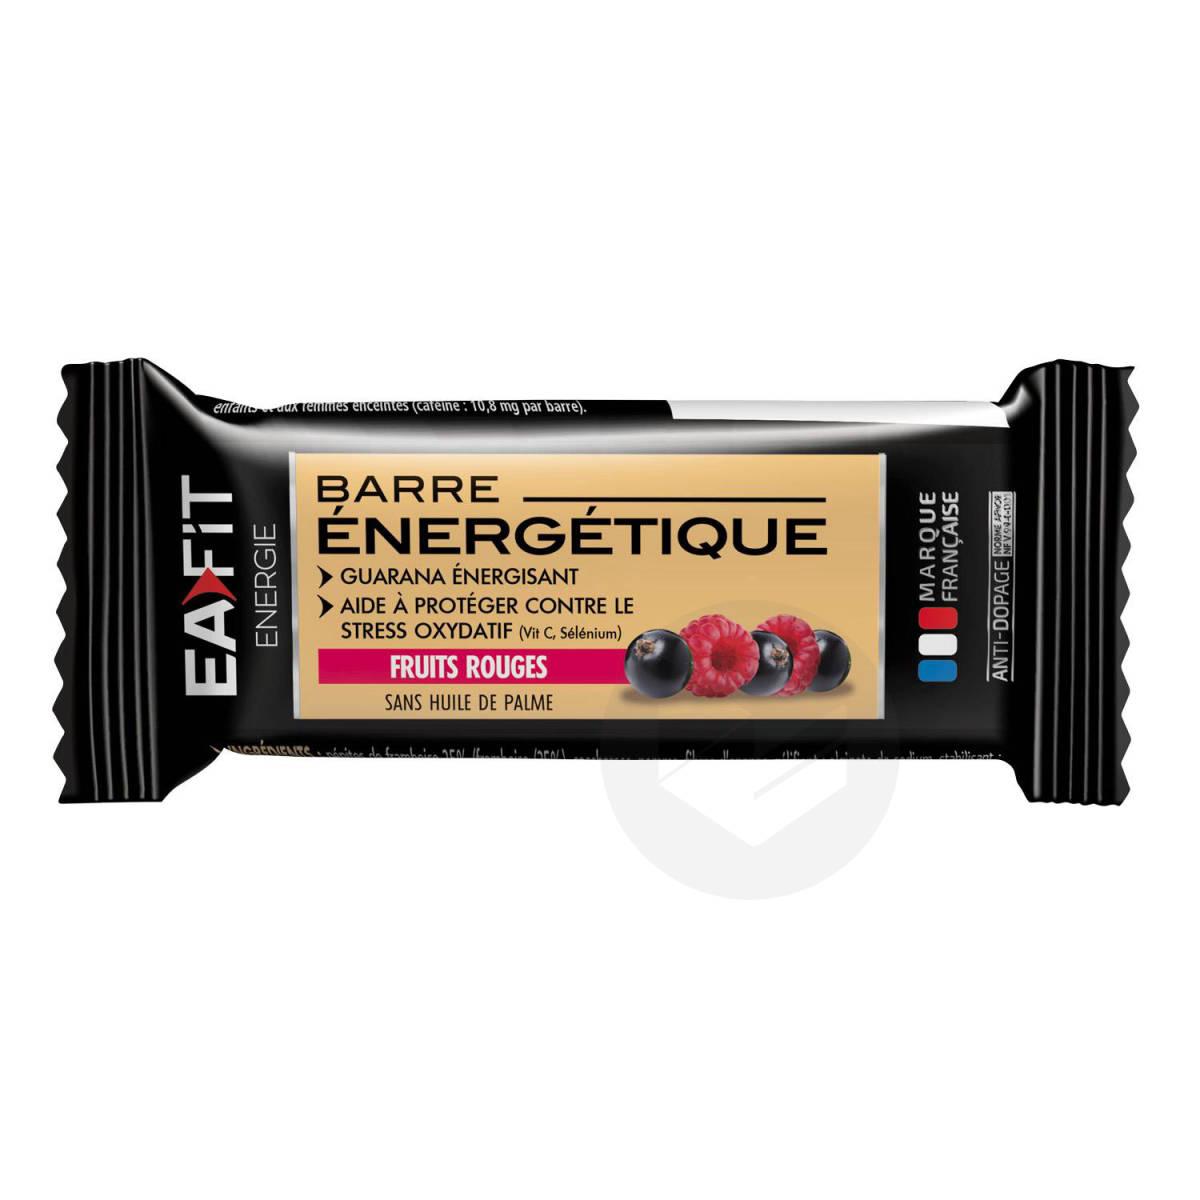 BARRE ENERGETIQUE Fruits Rouges  30g